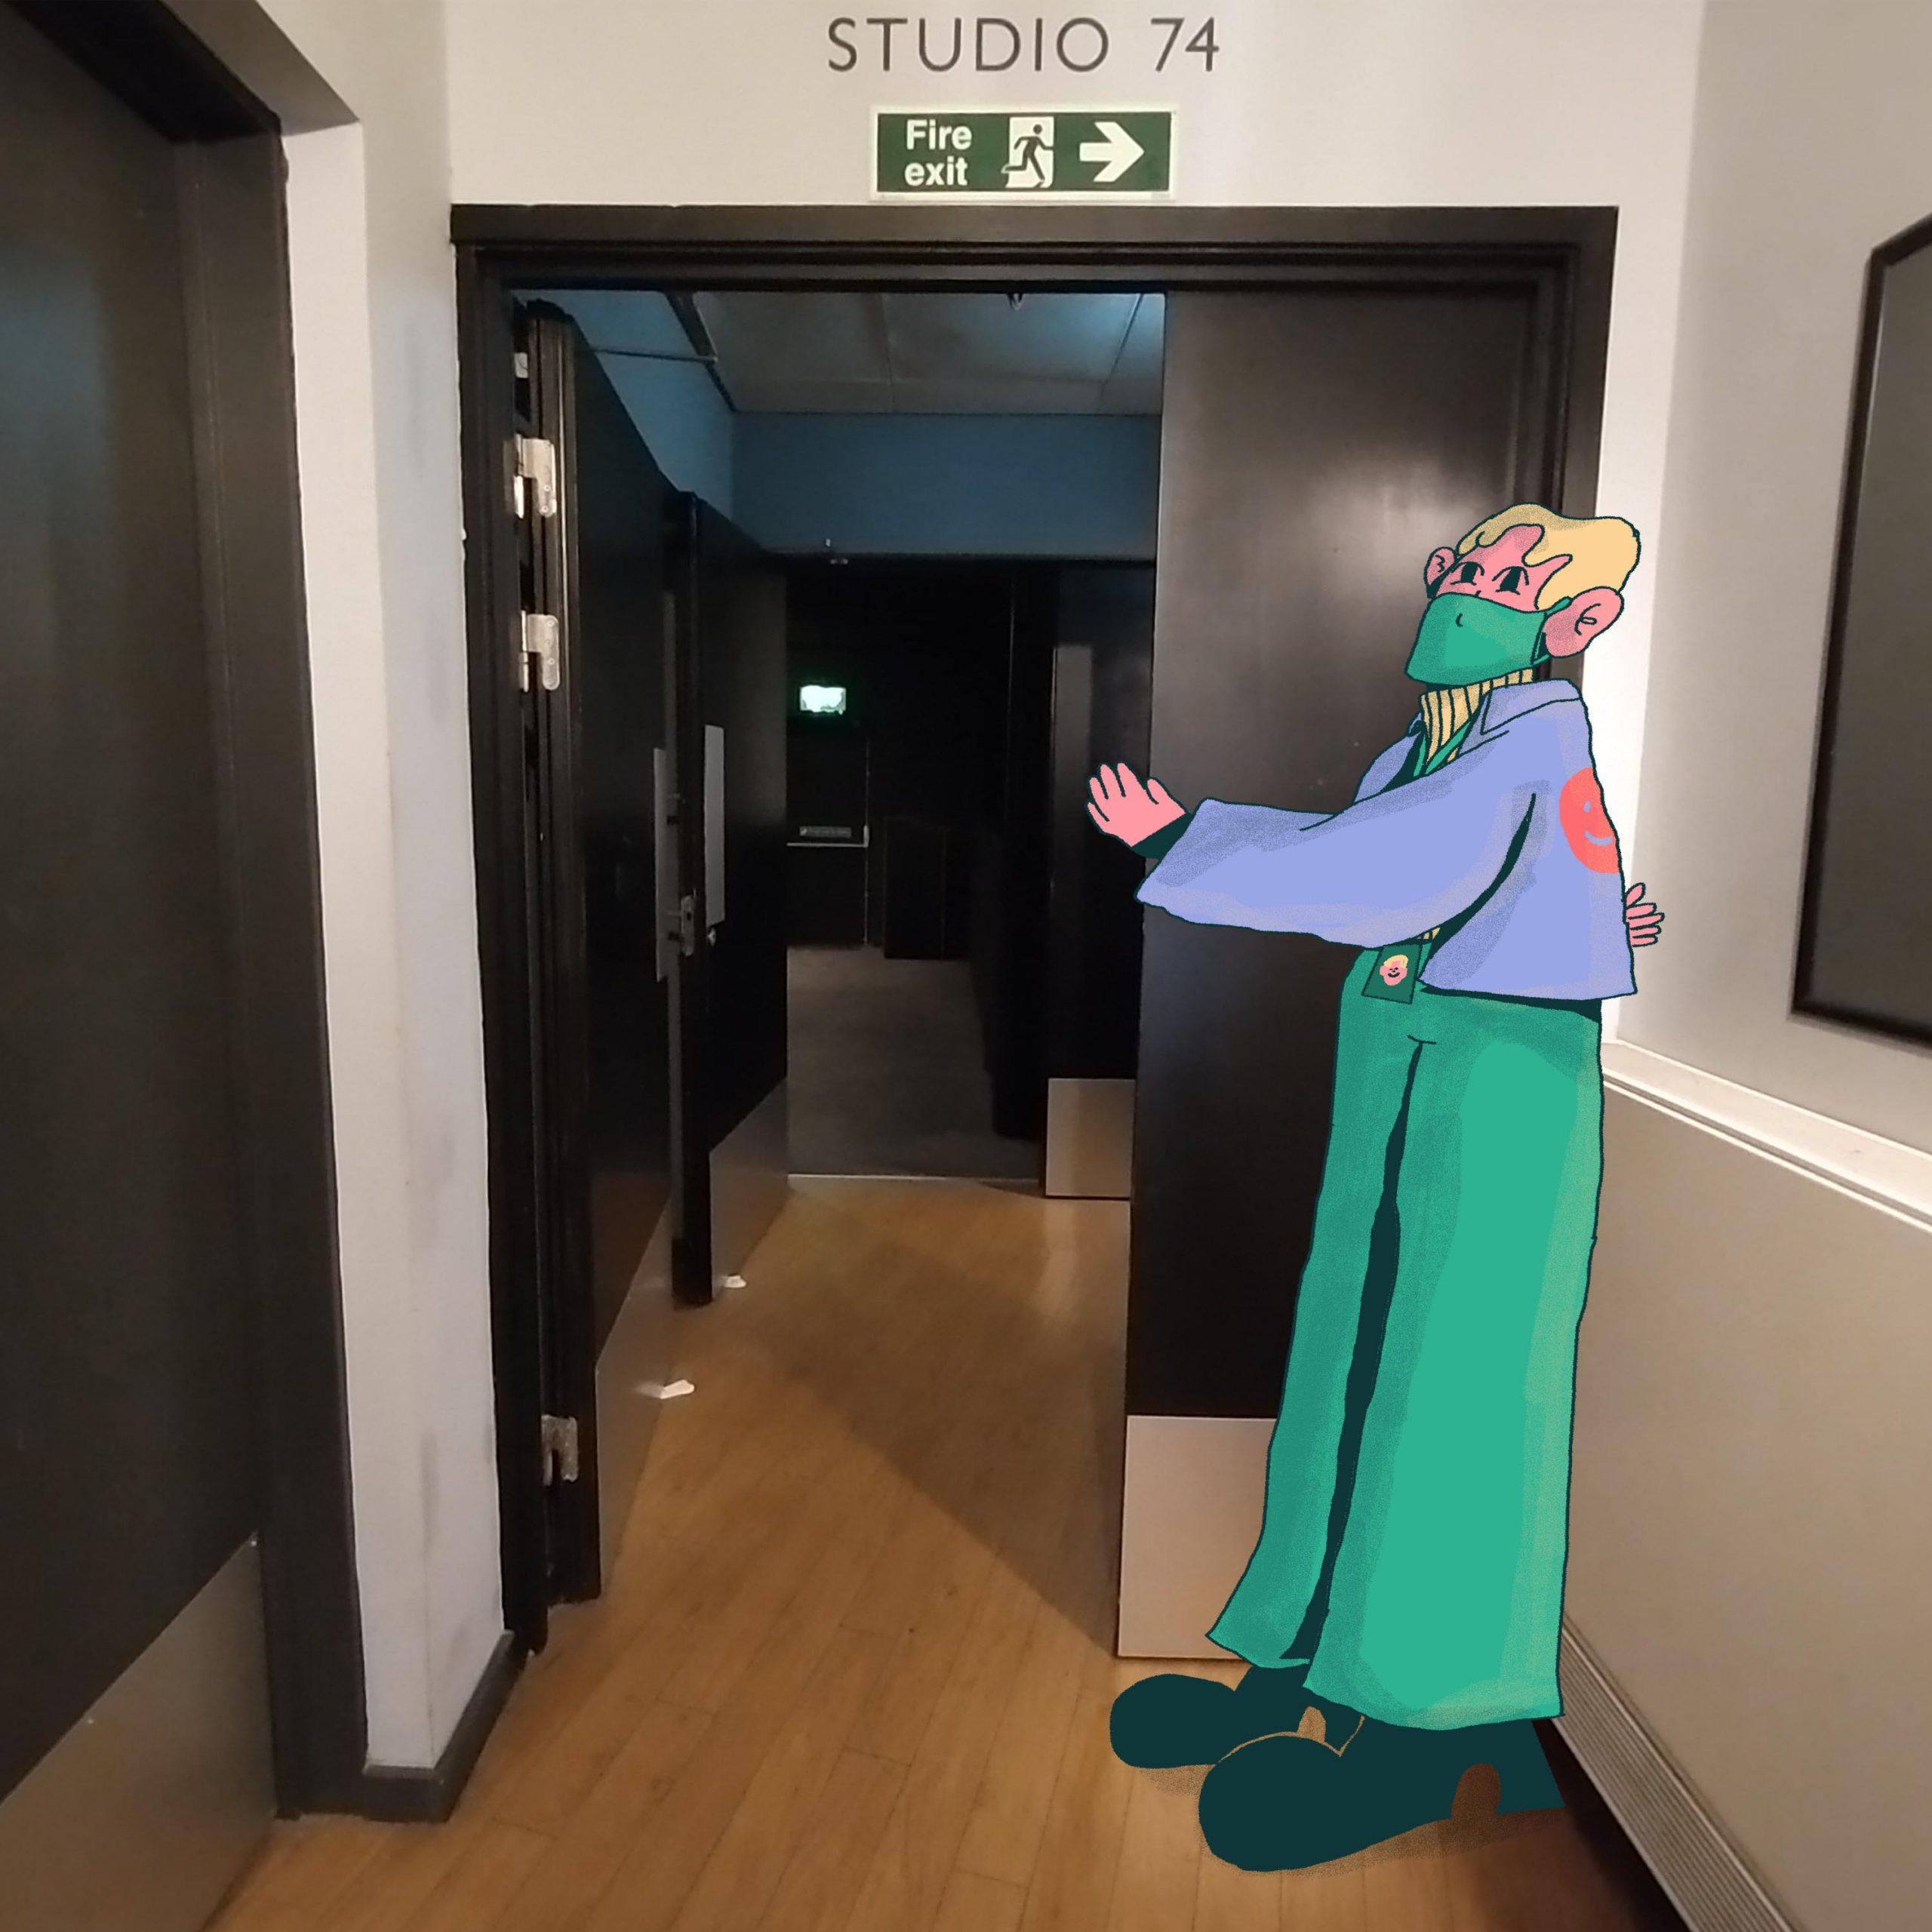 A cinema steward holds the cinema door open